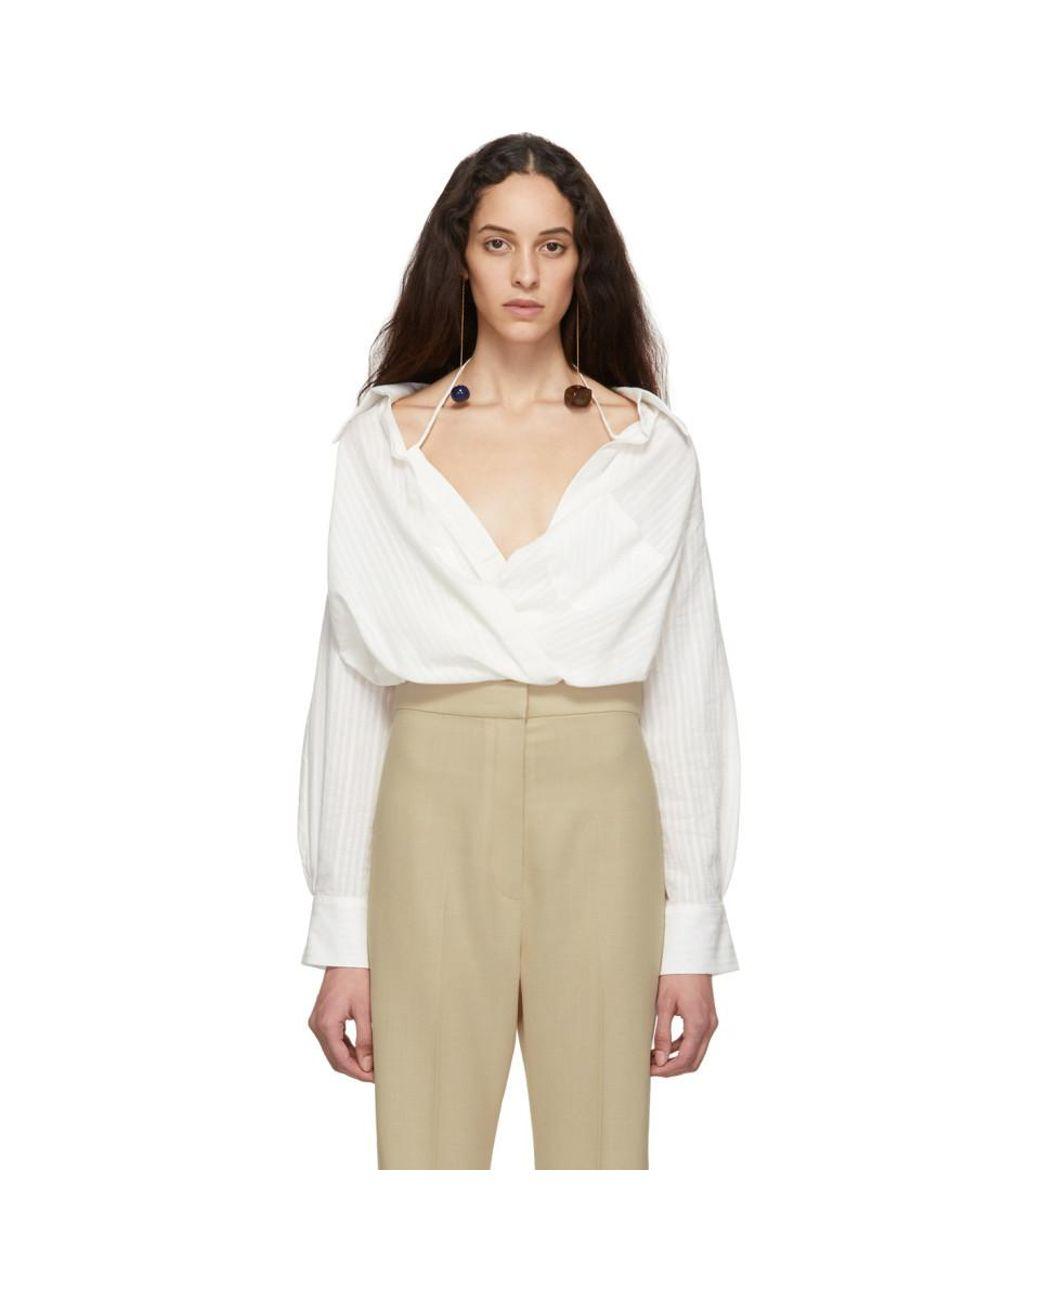 579f69c2746 Jacquemus Off-white La Chemise Siena Shirt in White - Lyst